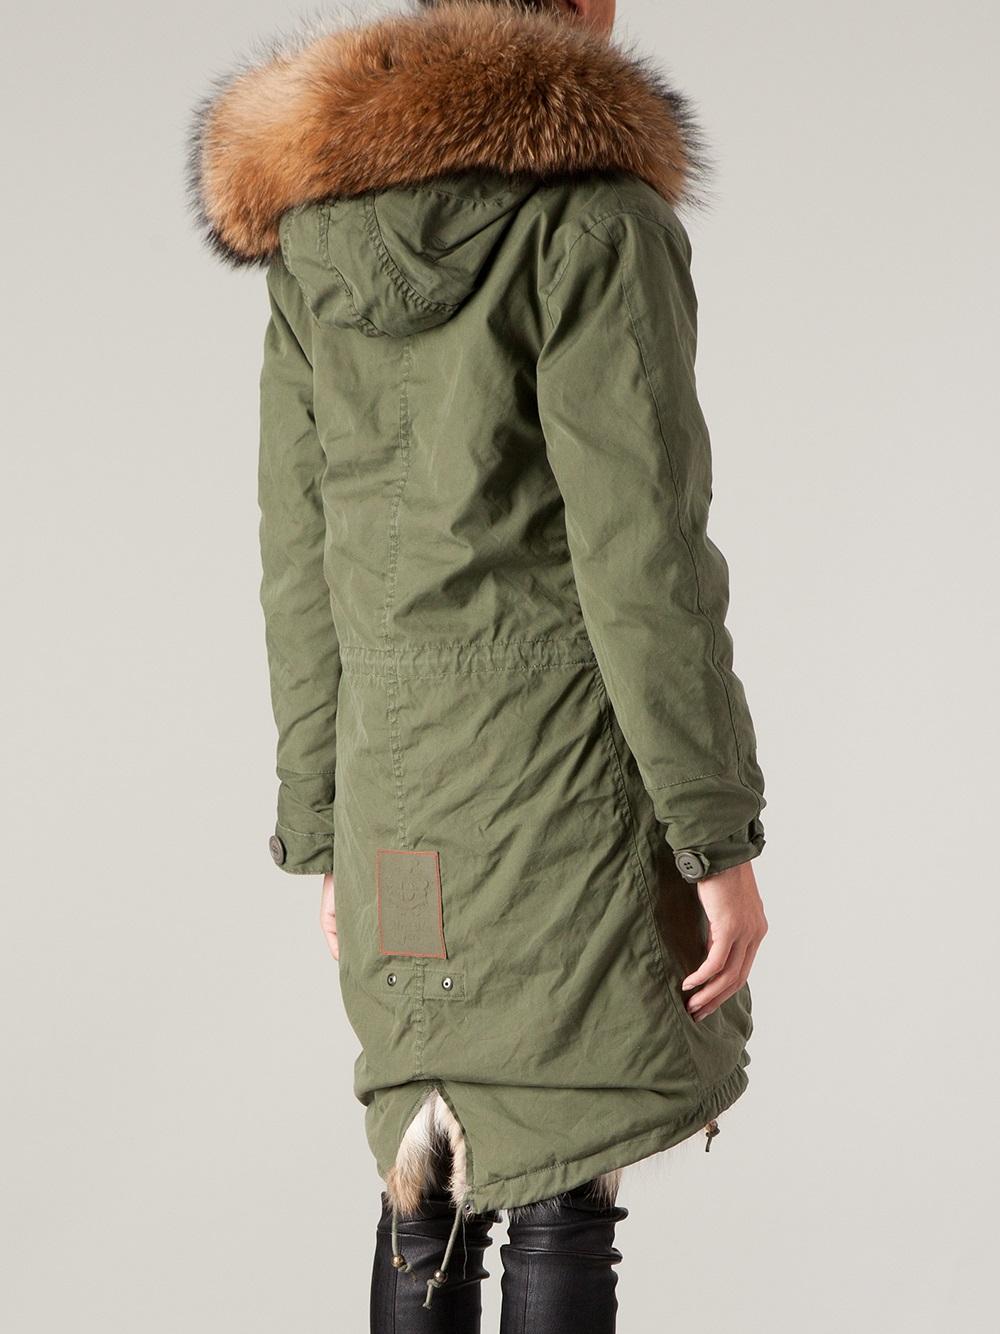 Green Fur Lined Parka